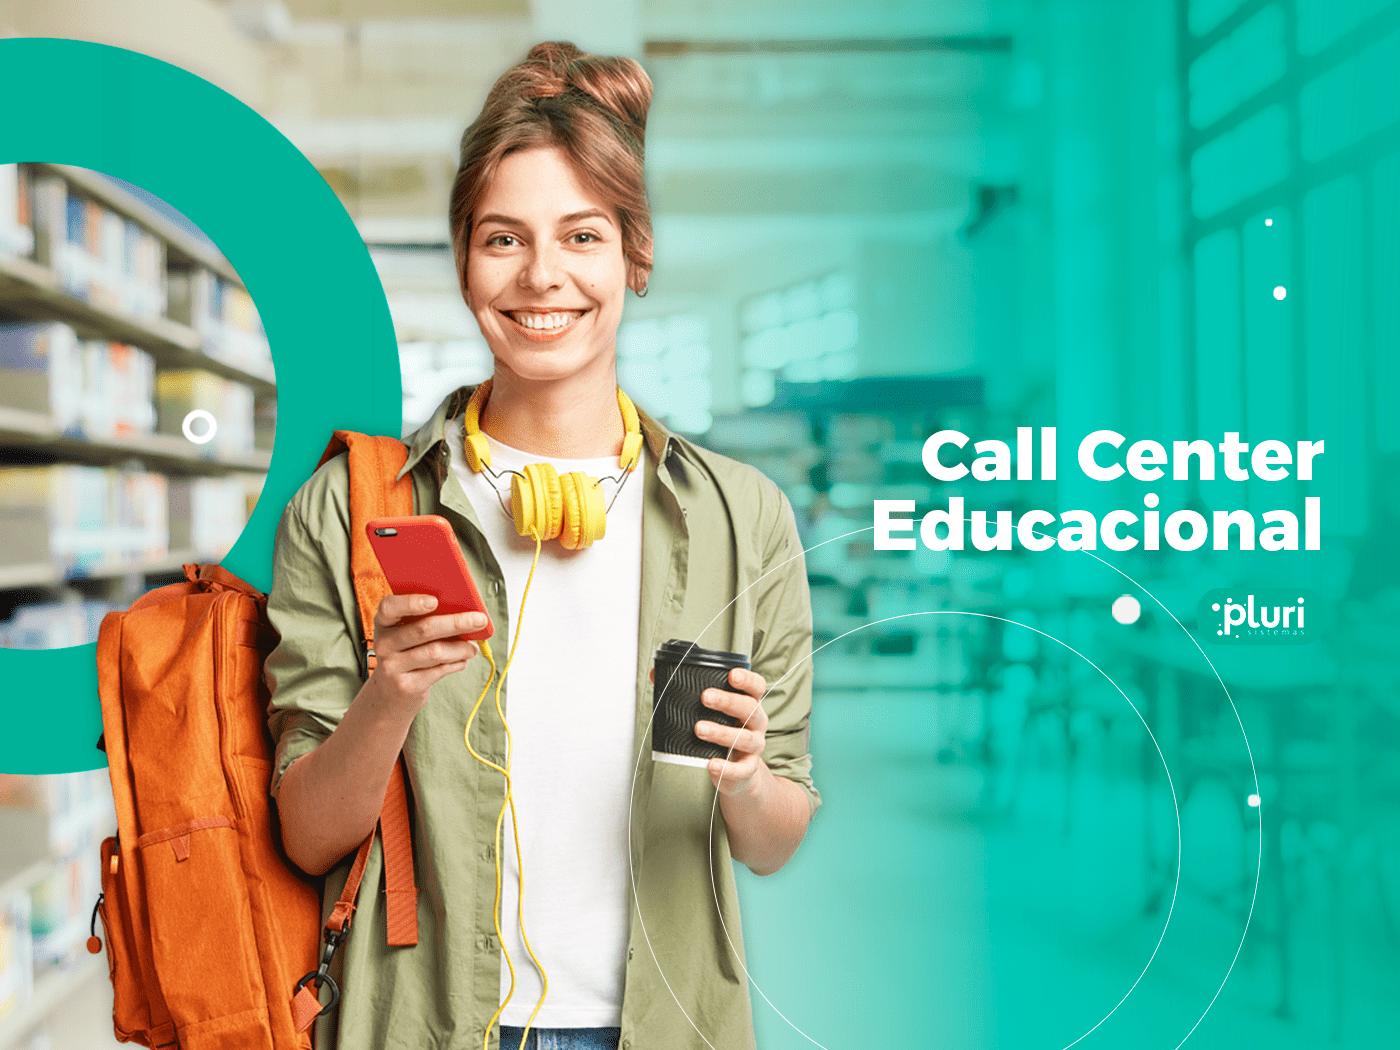 call center educacional pluri sistemas